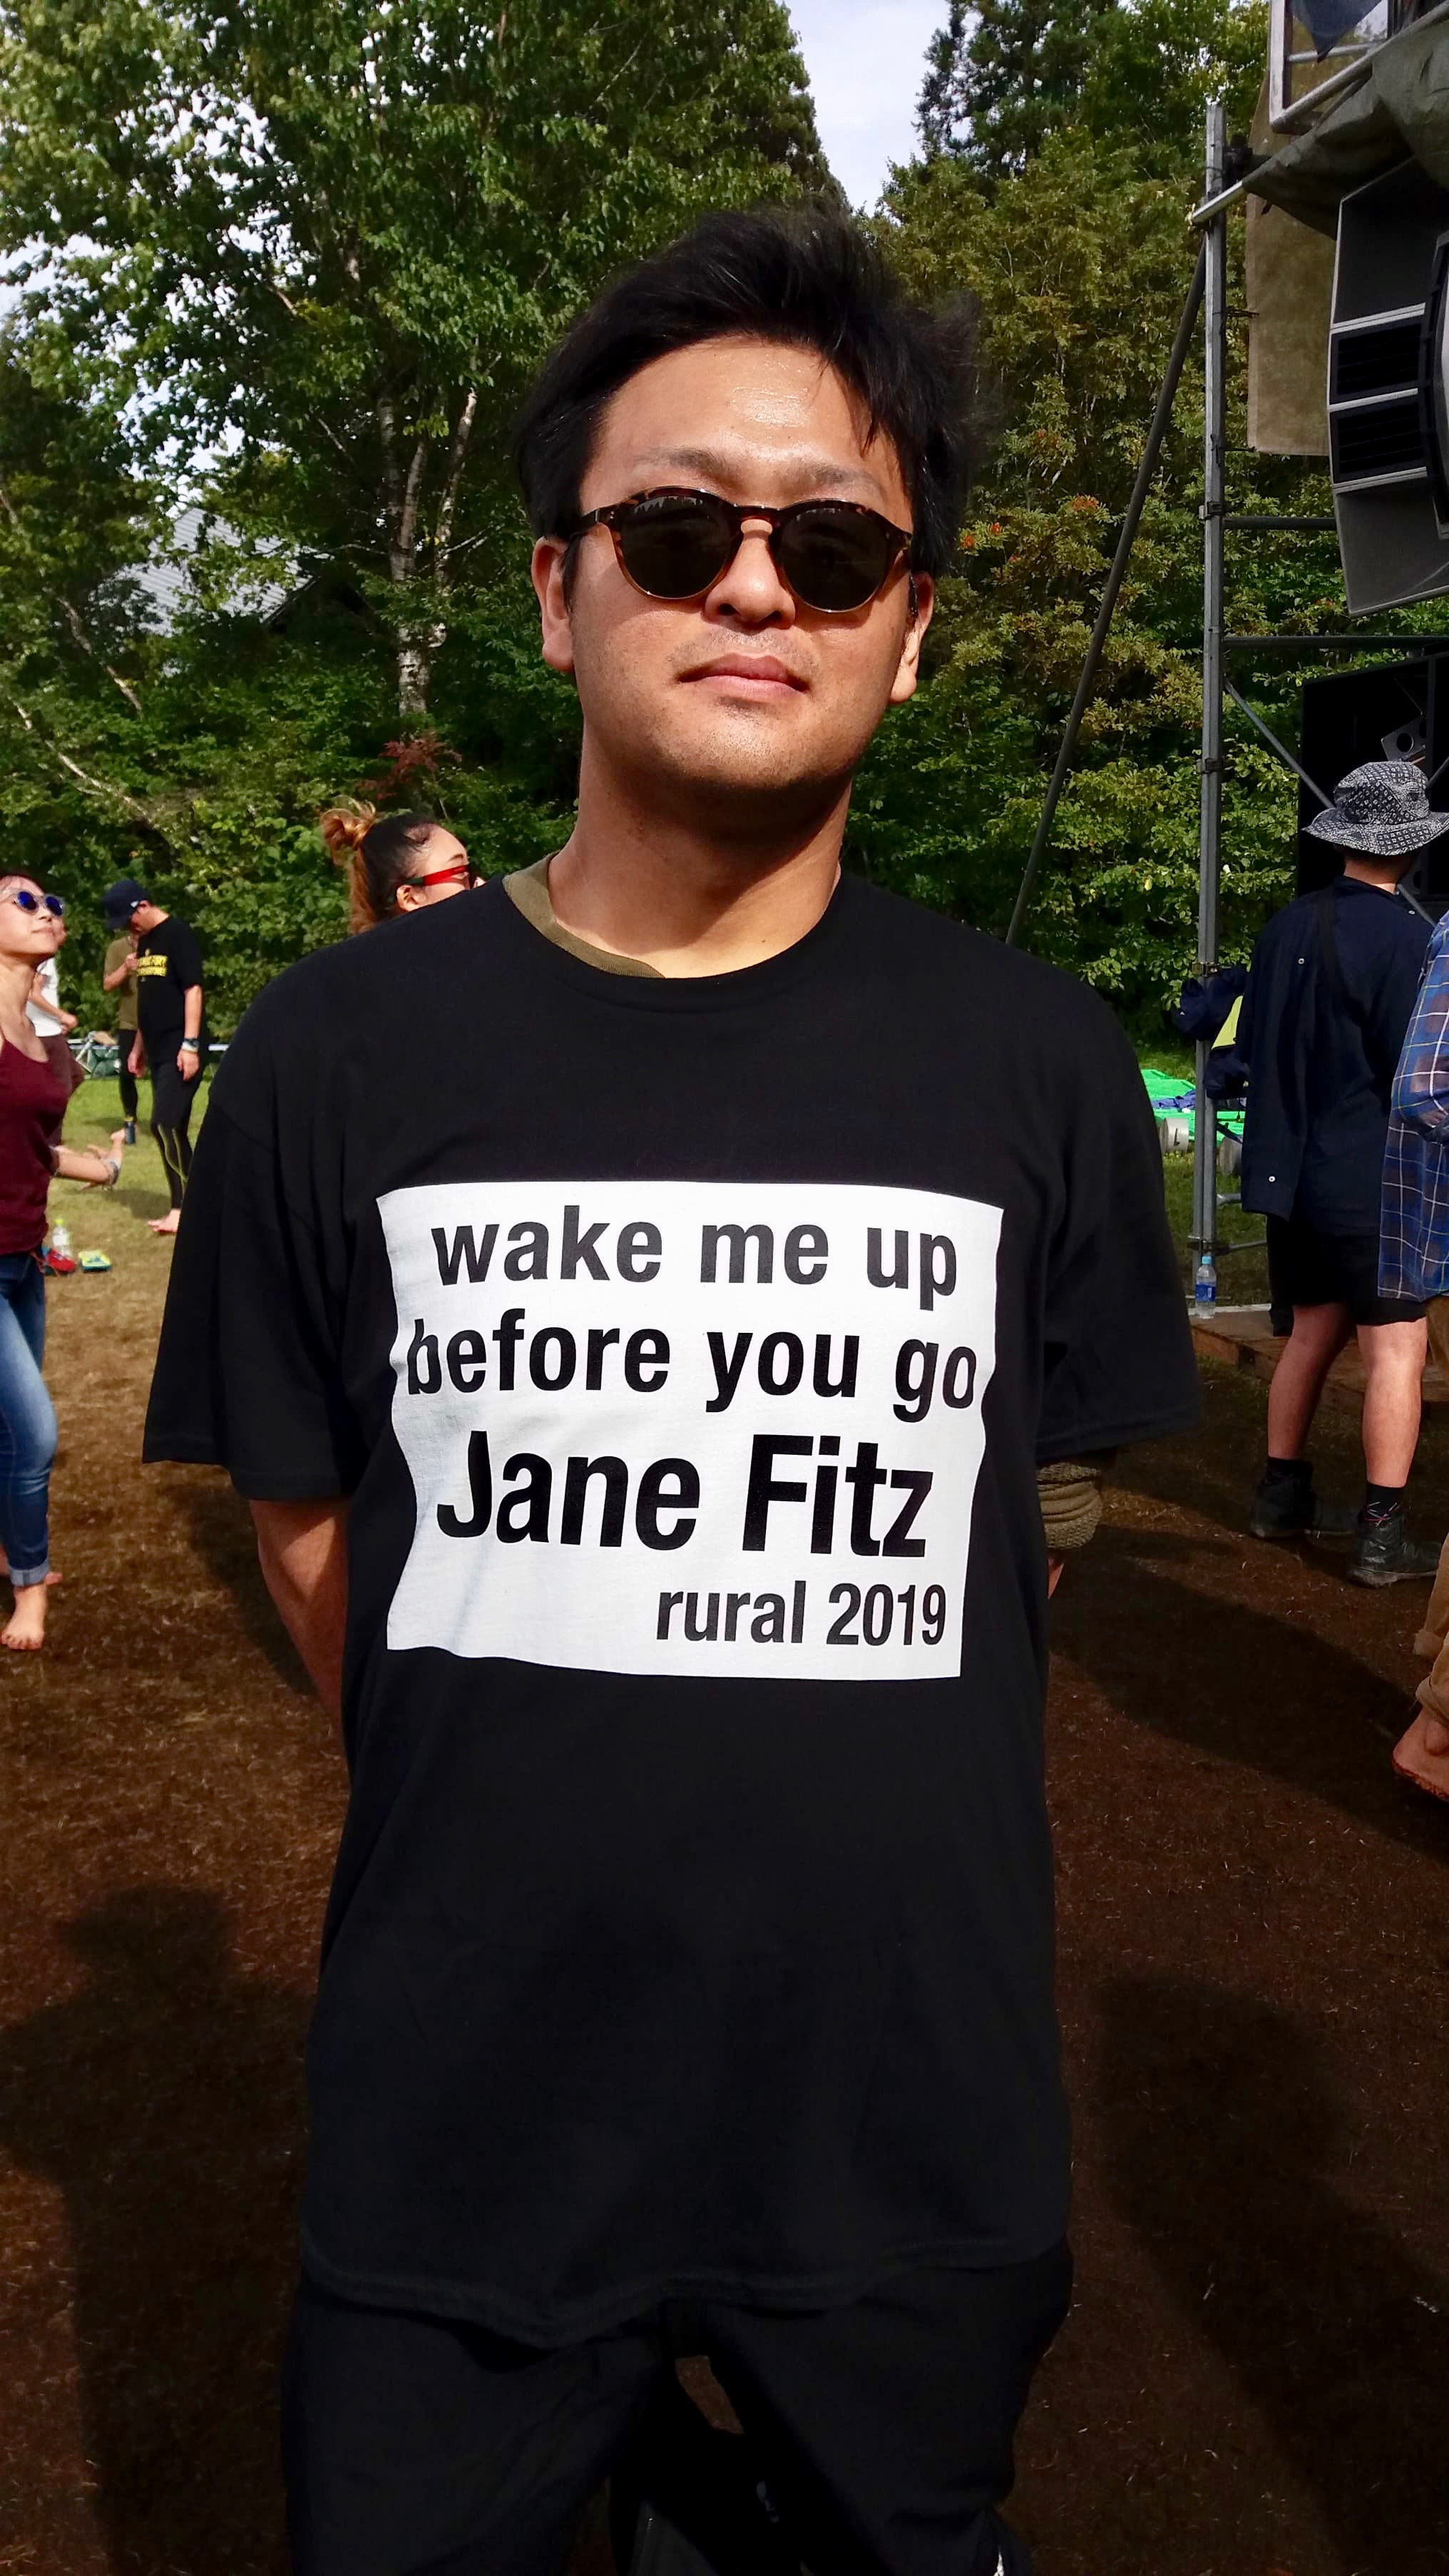 Wake me up before you go Jane Fitz